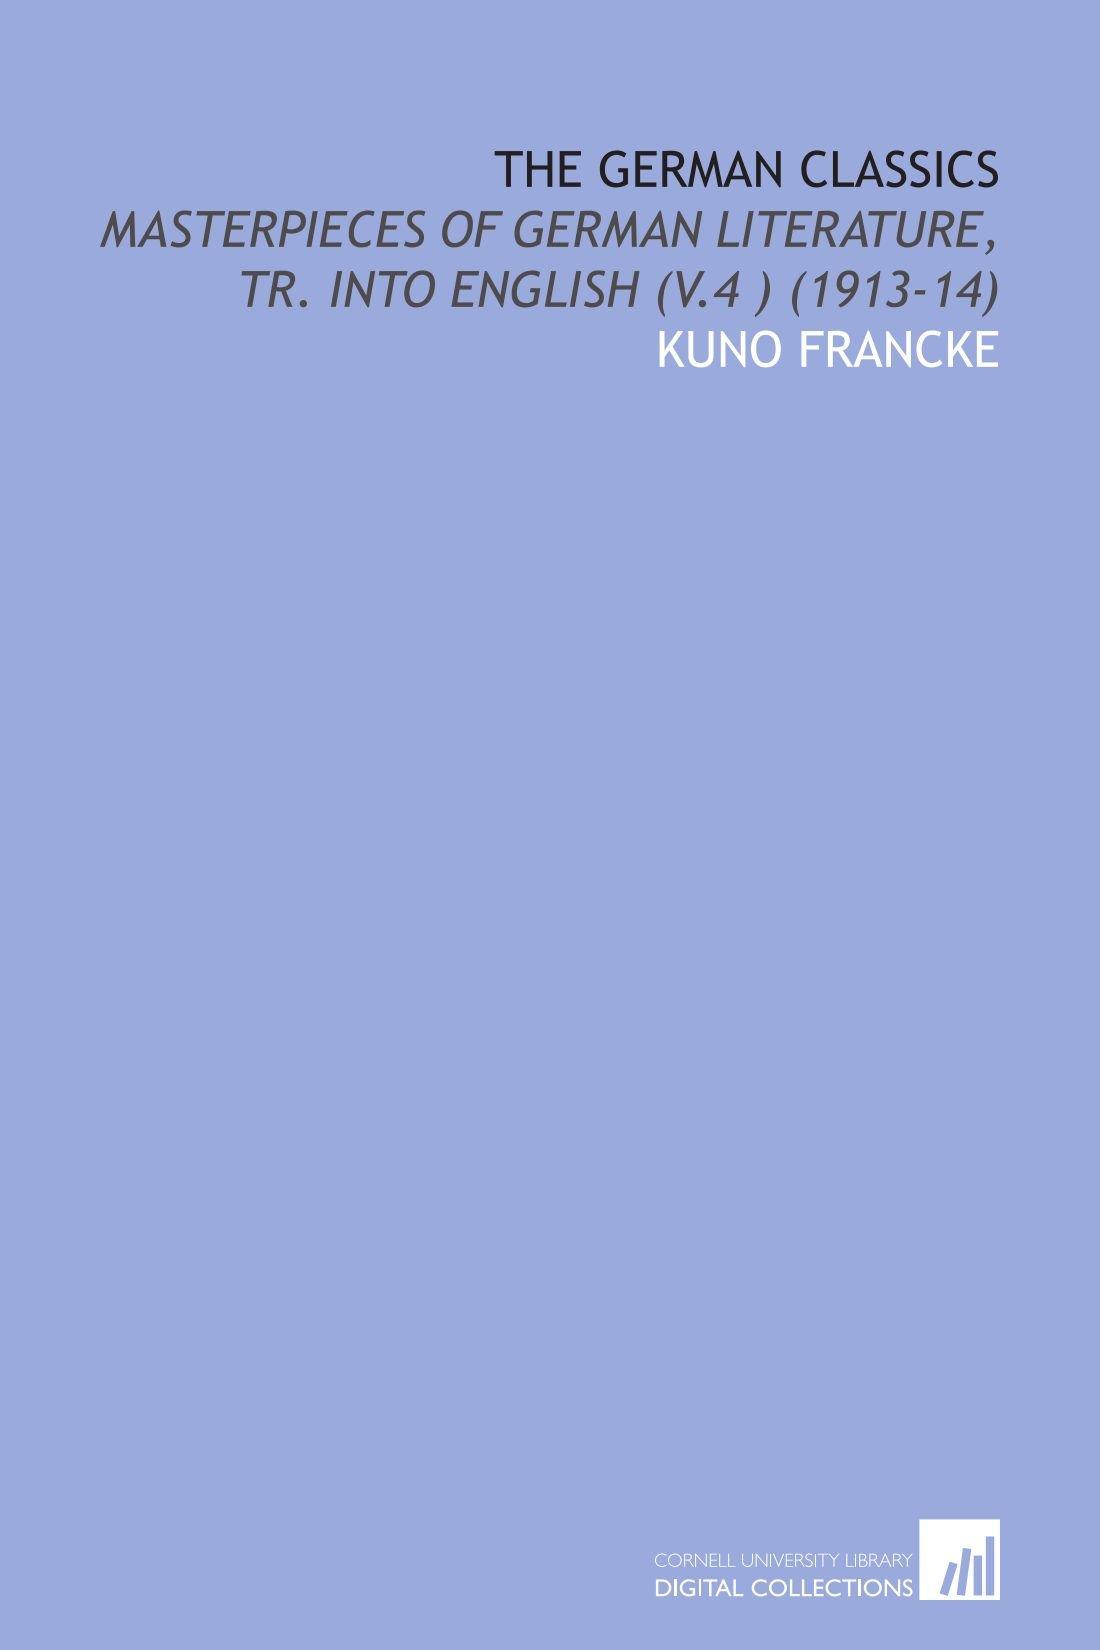 Download The German Classics: Masterpieces of German Literature, Tr. Into English (V.4 ) (1913-14) pdf